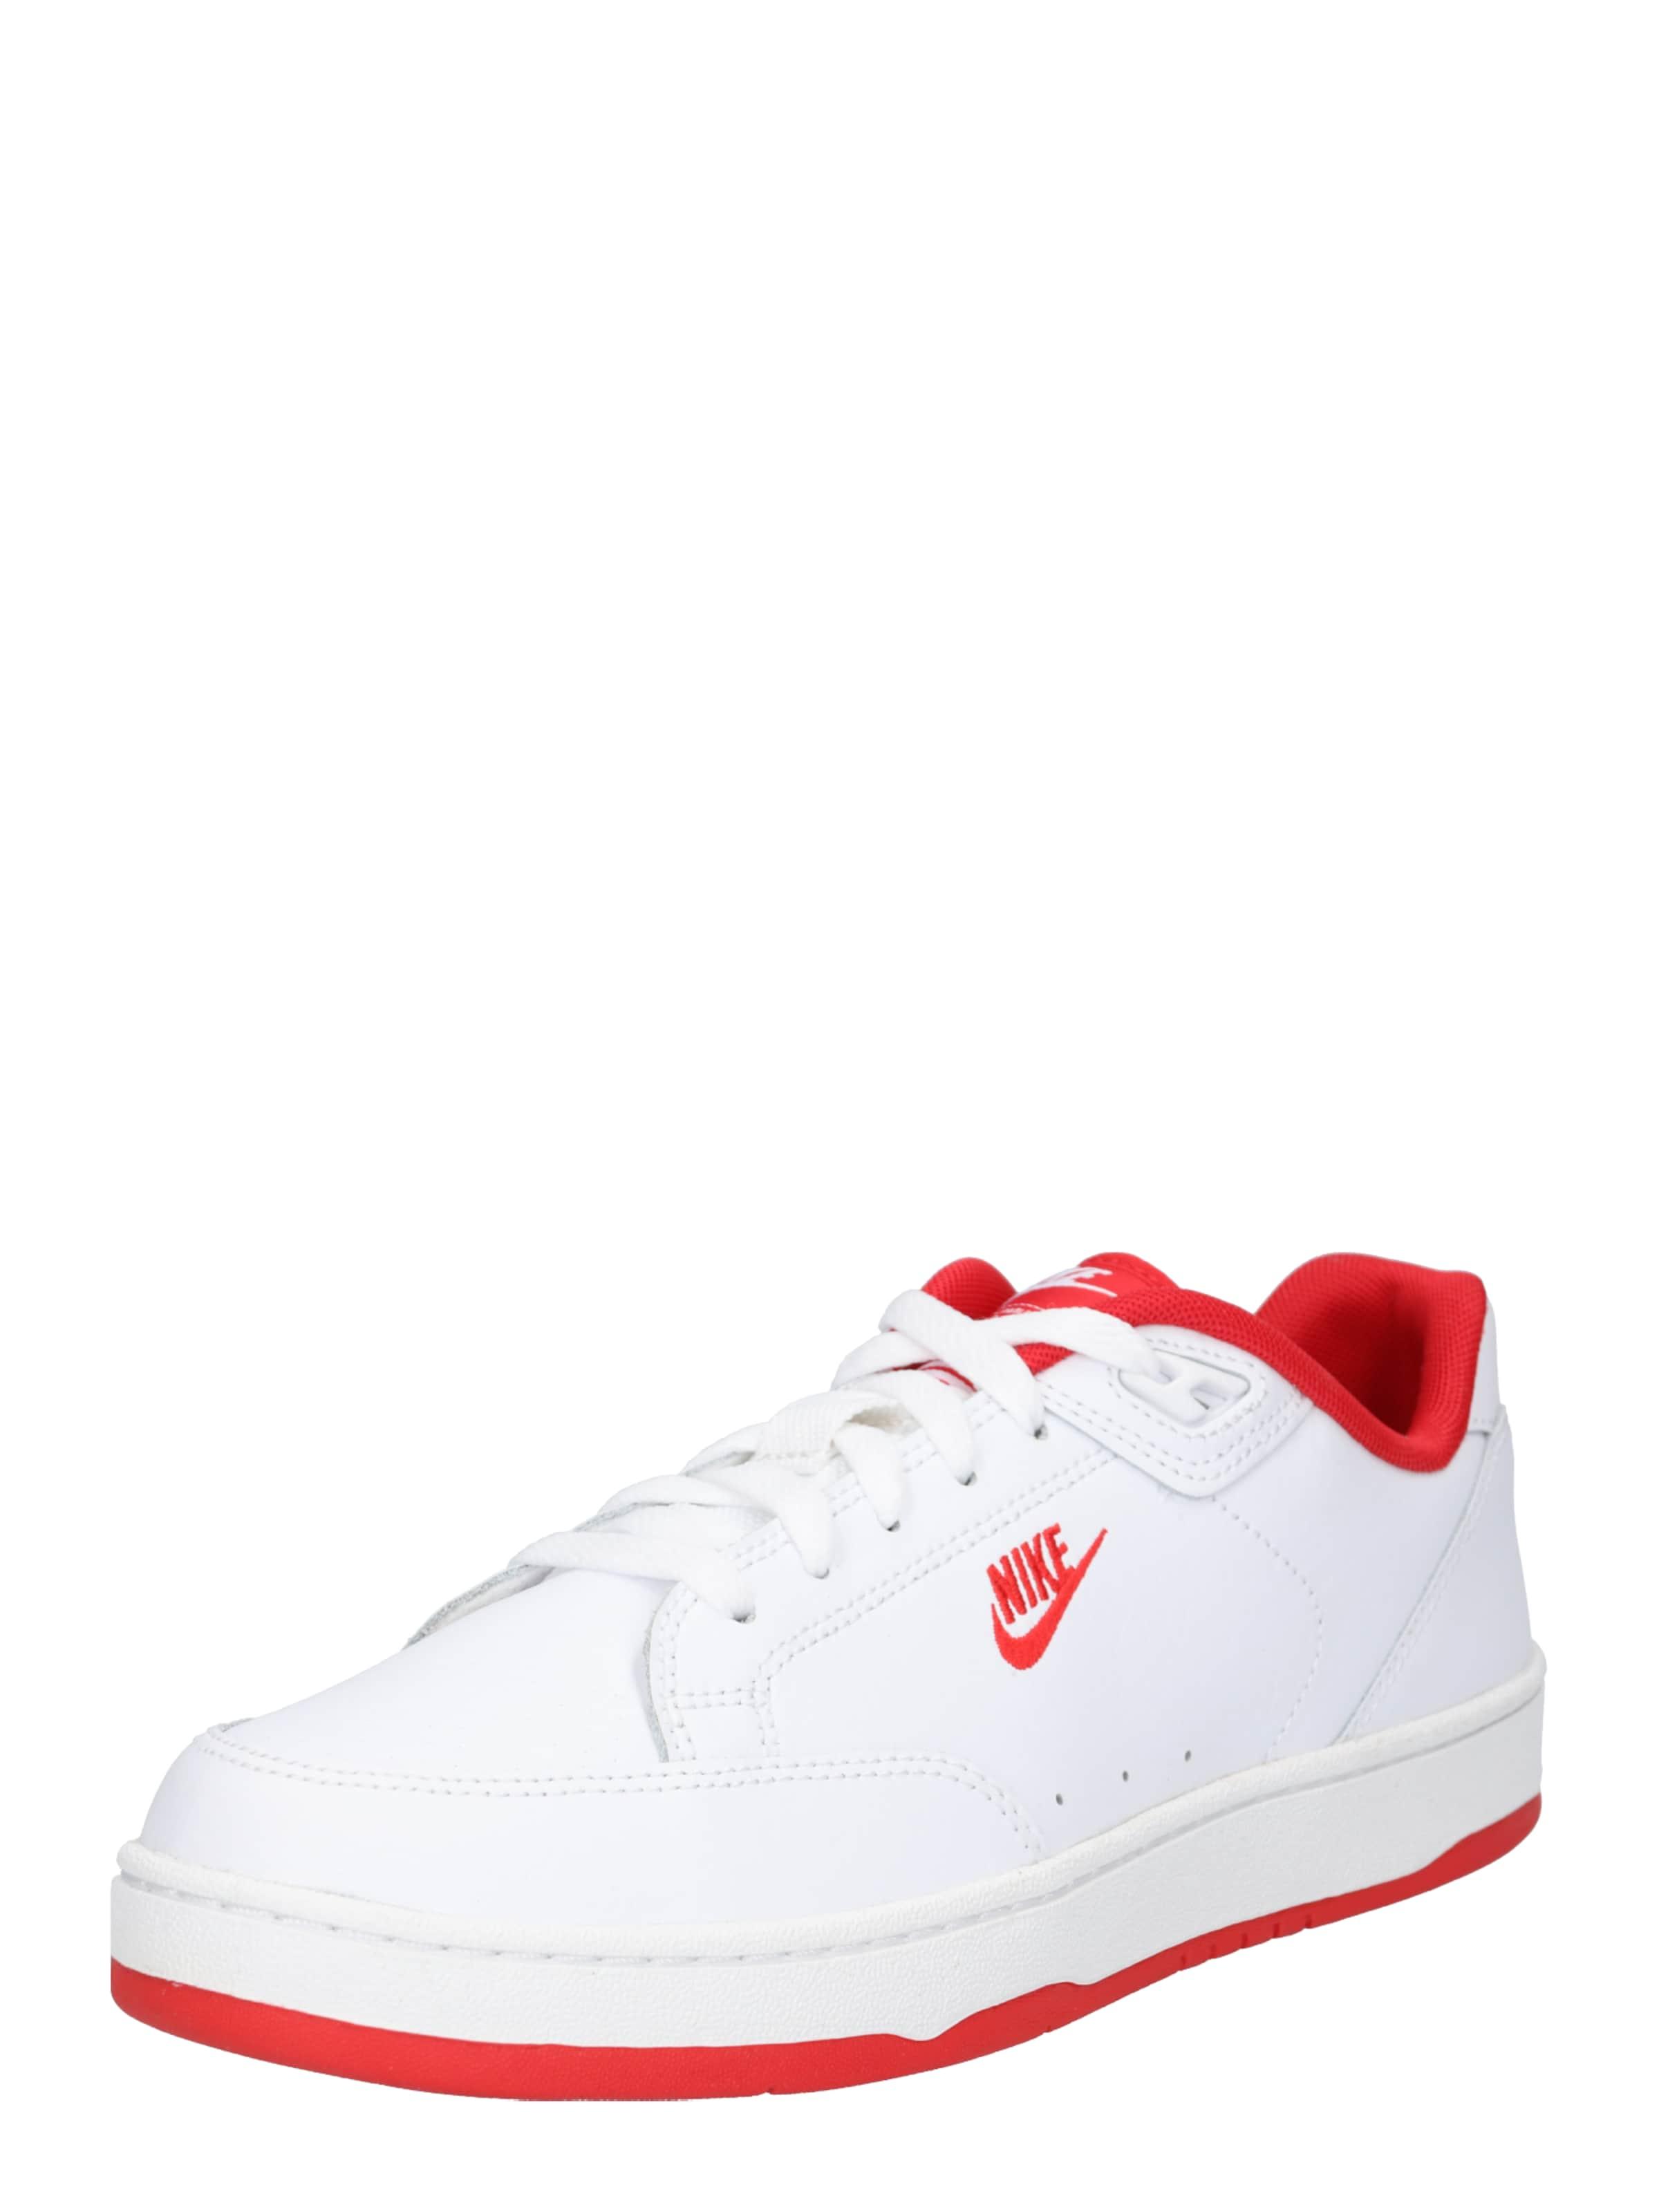 Sneaker Ii' Sportswear Nike 'grandstand In RotWeiß Rc54AjL3q